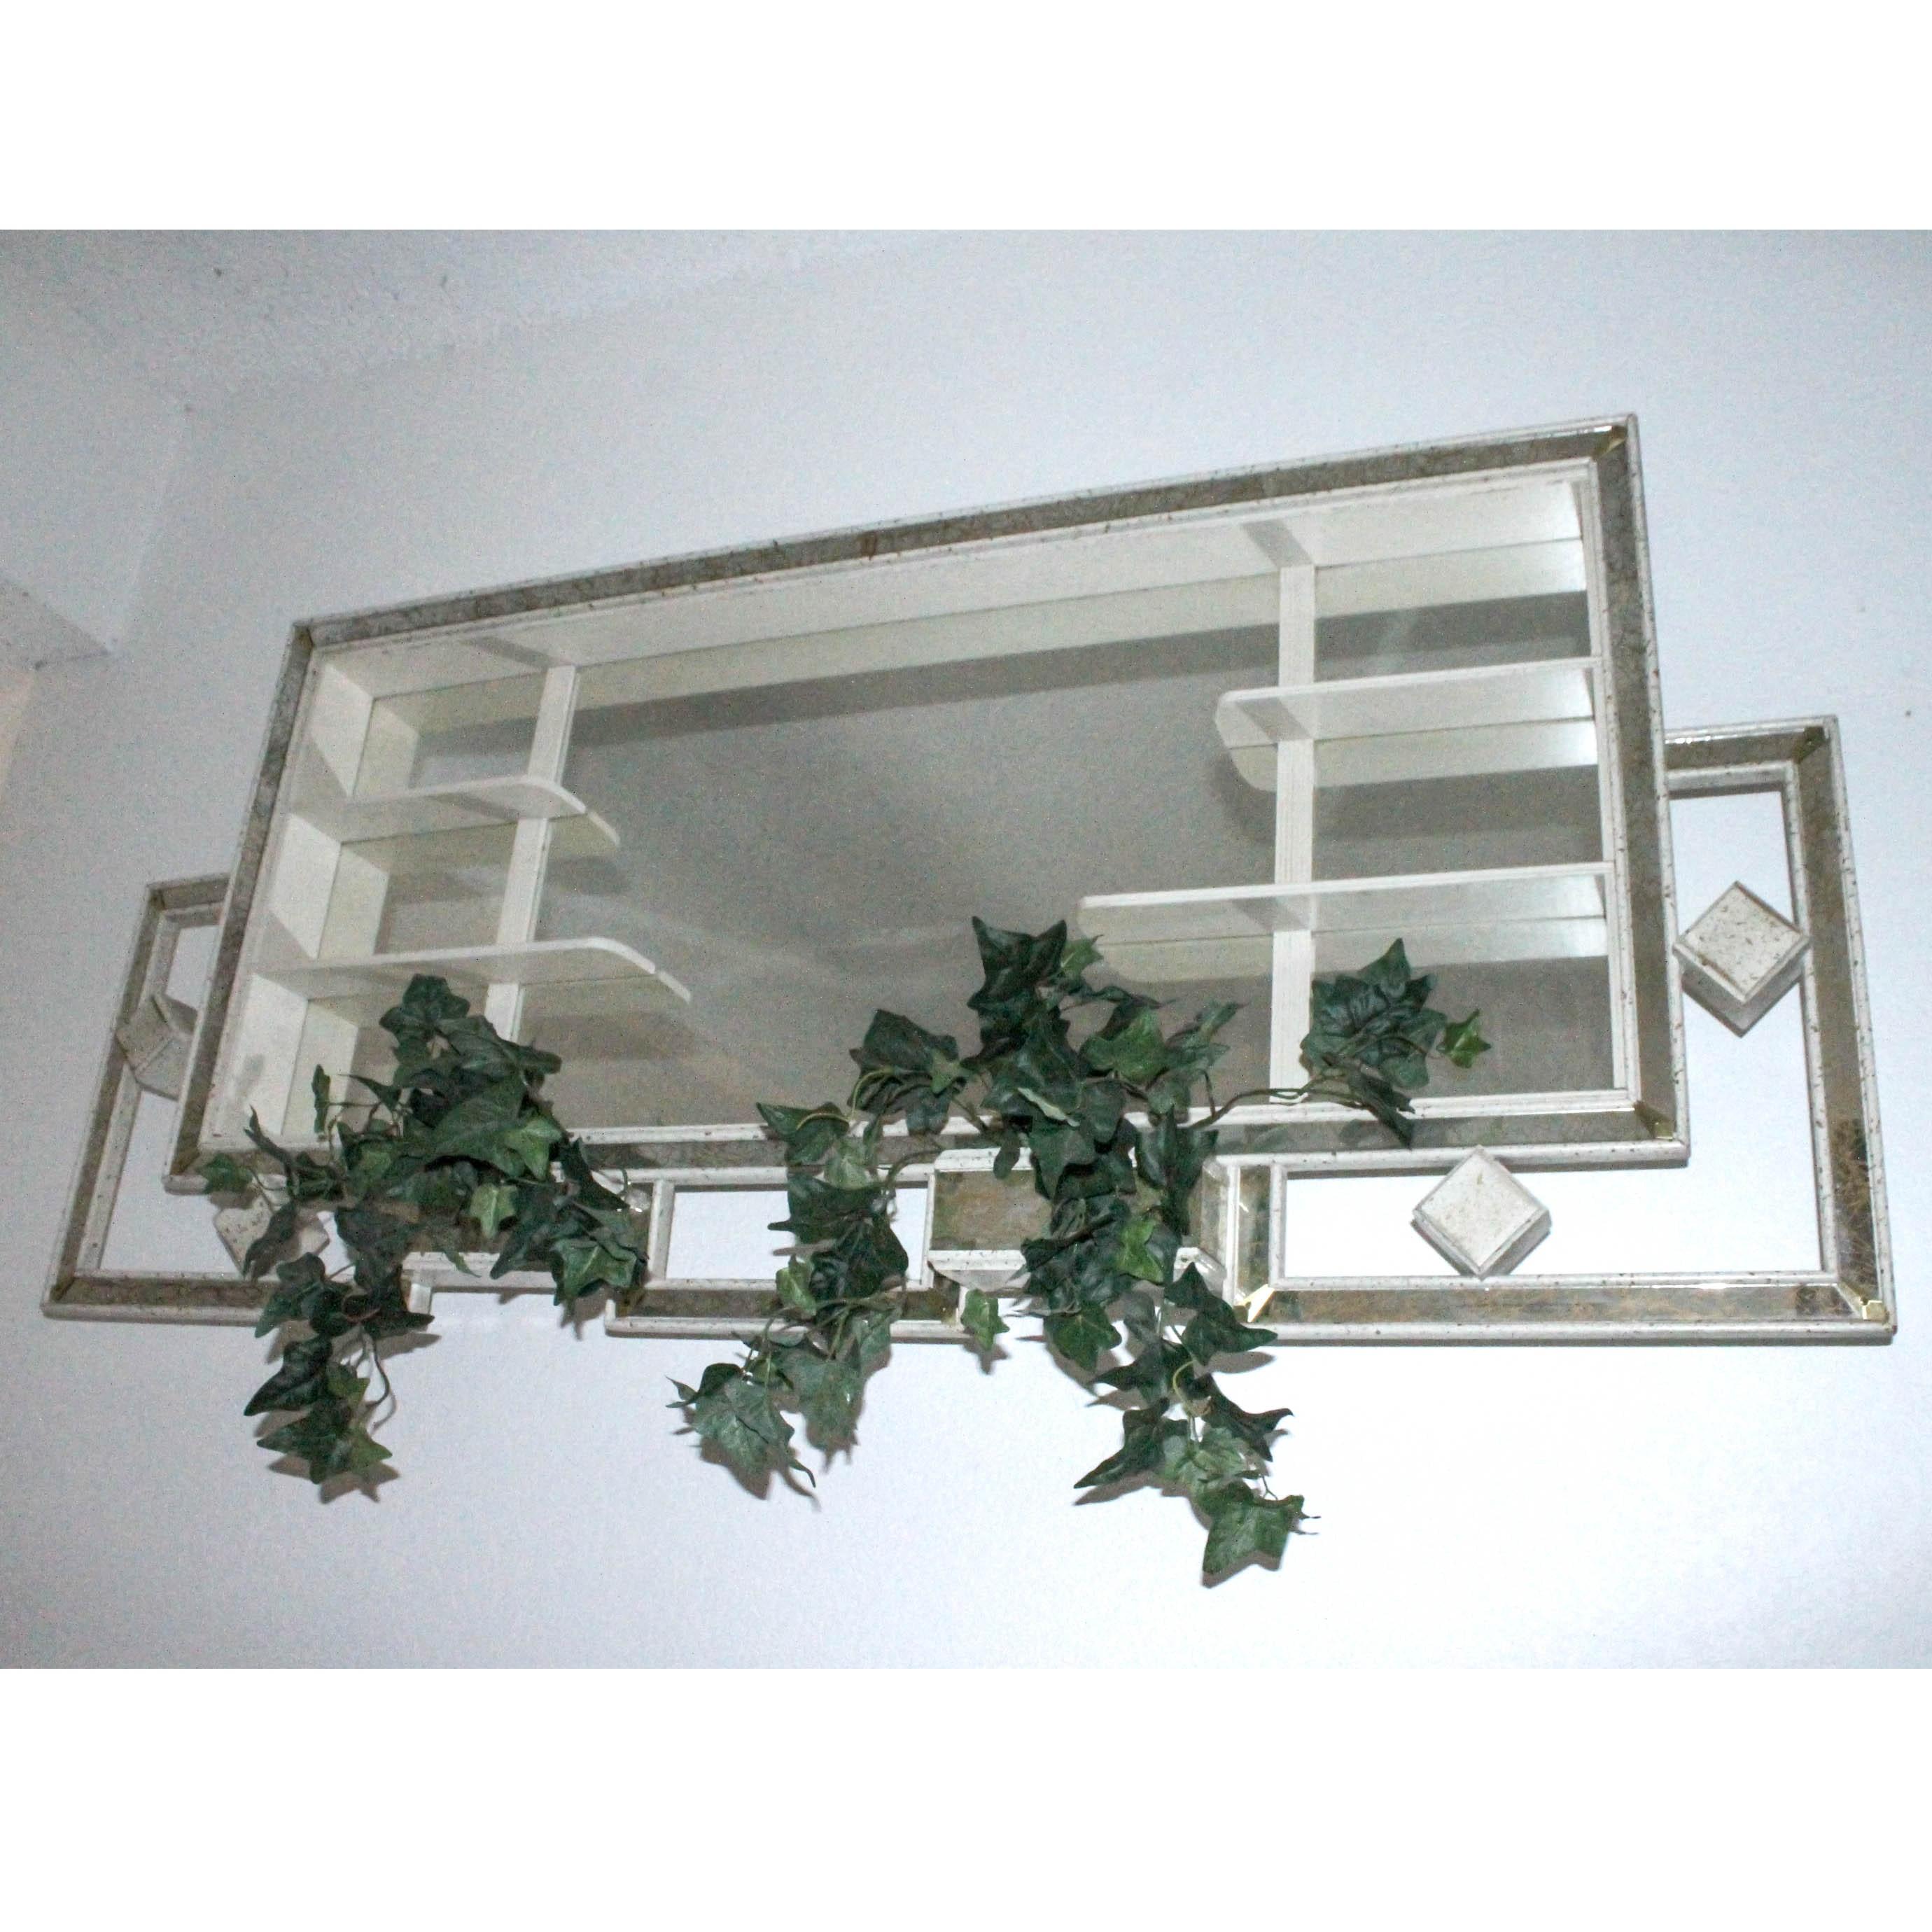 Vintage Mirrored Wall Shadowbox